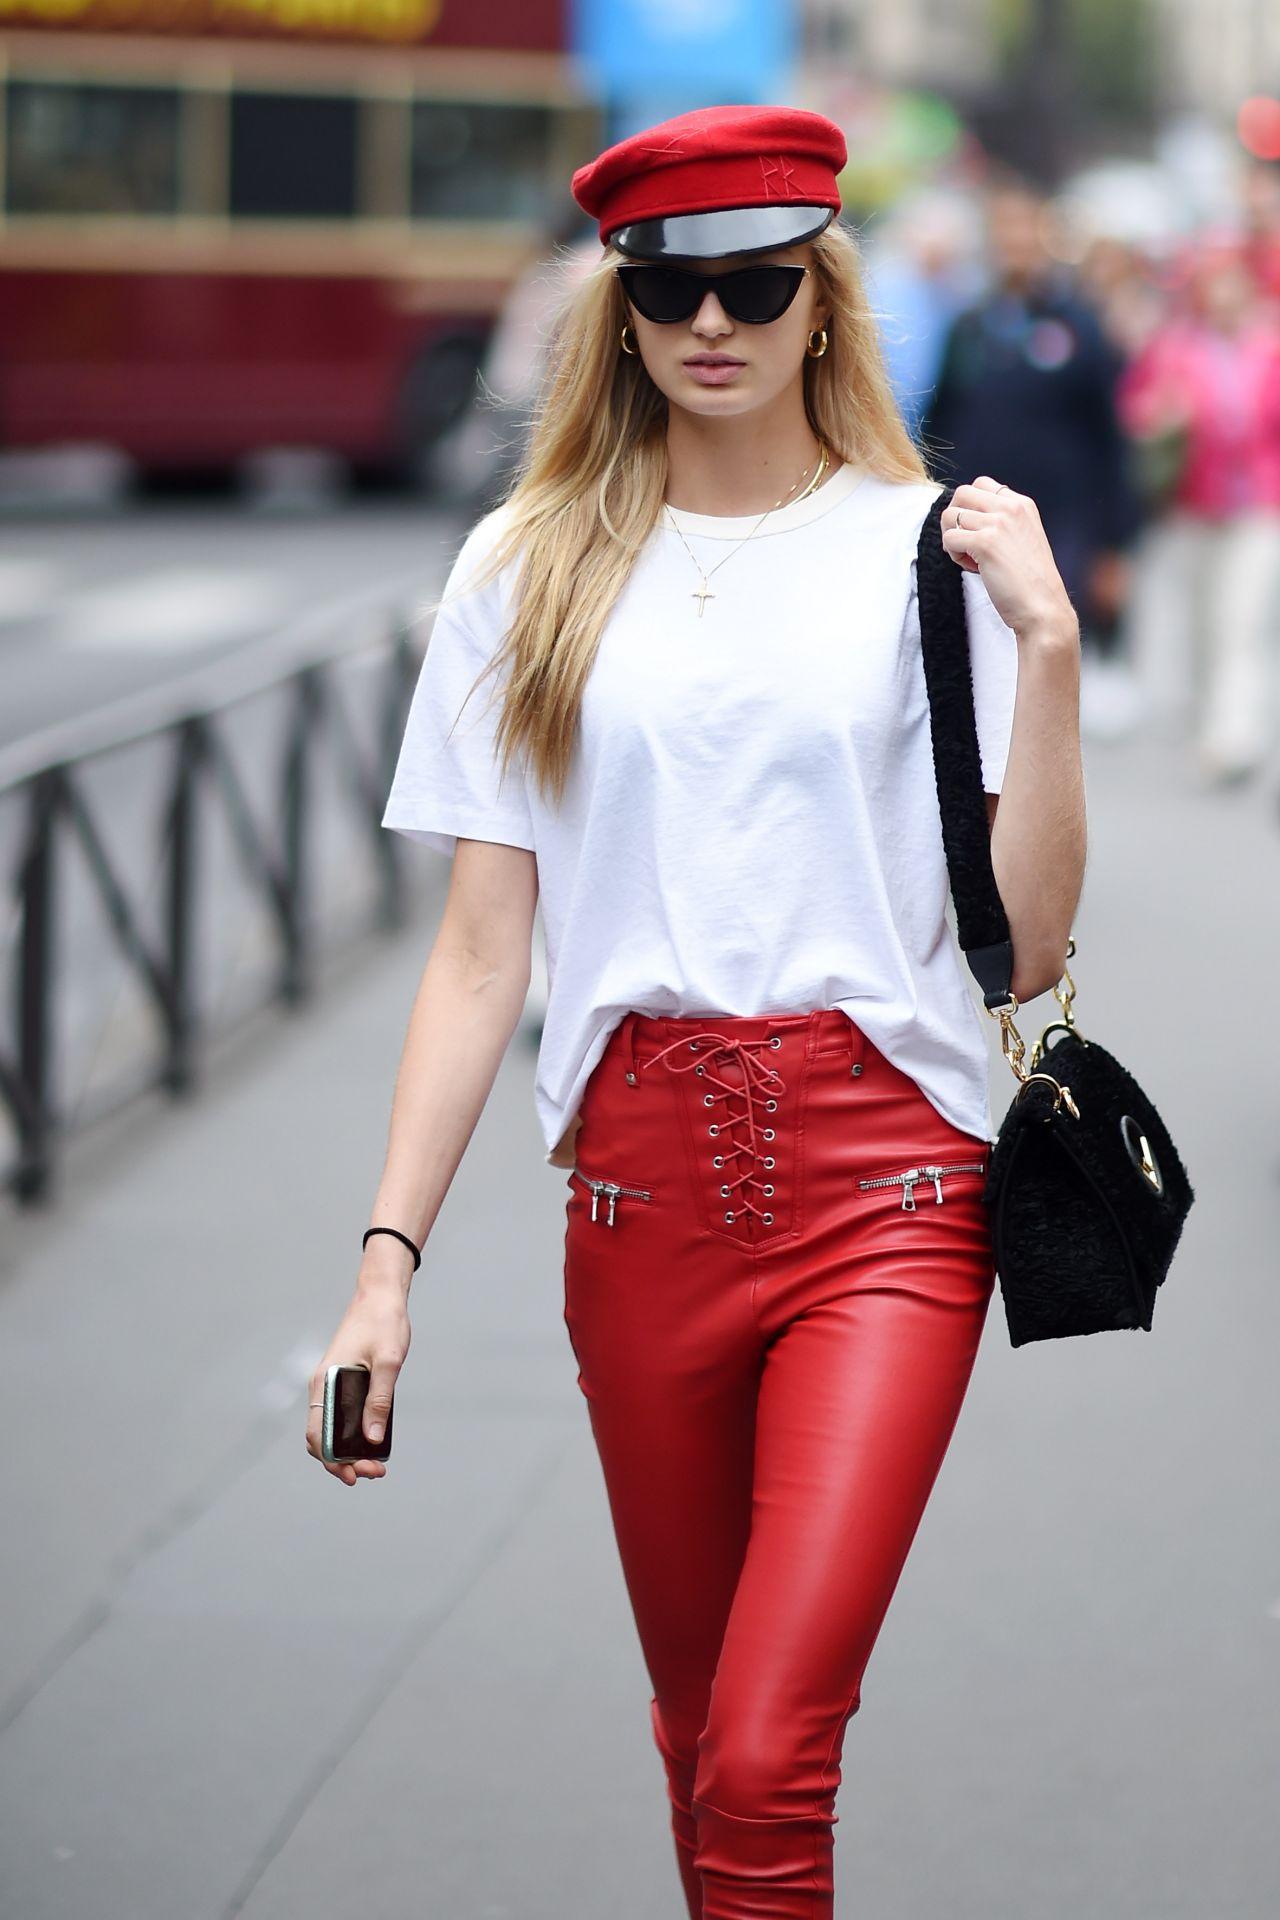 Romee Strijd Paris Fashion Week France 09 28 2017